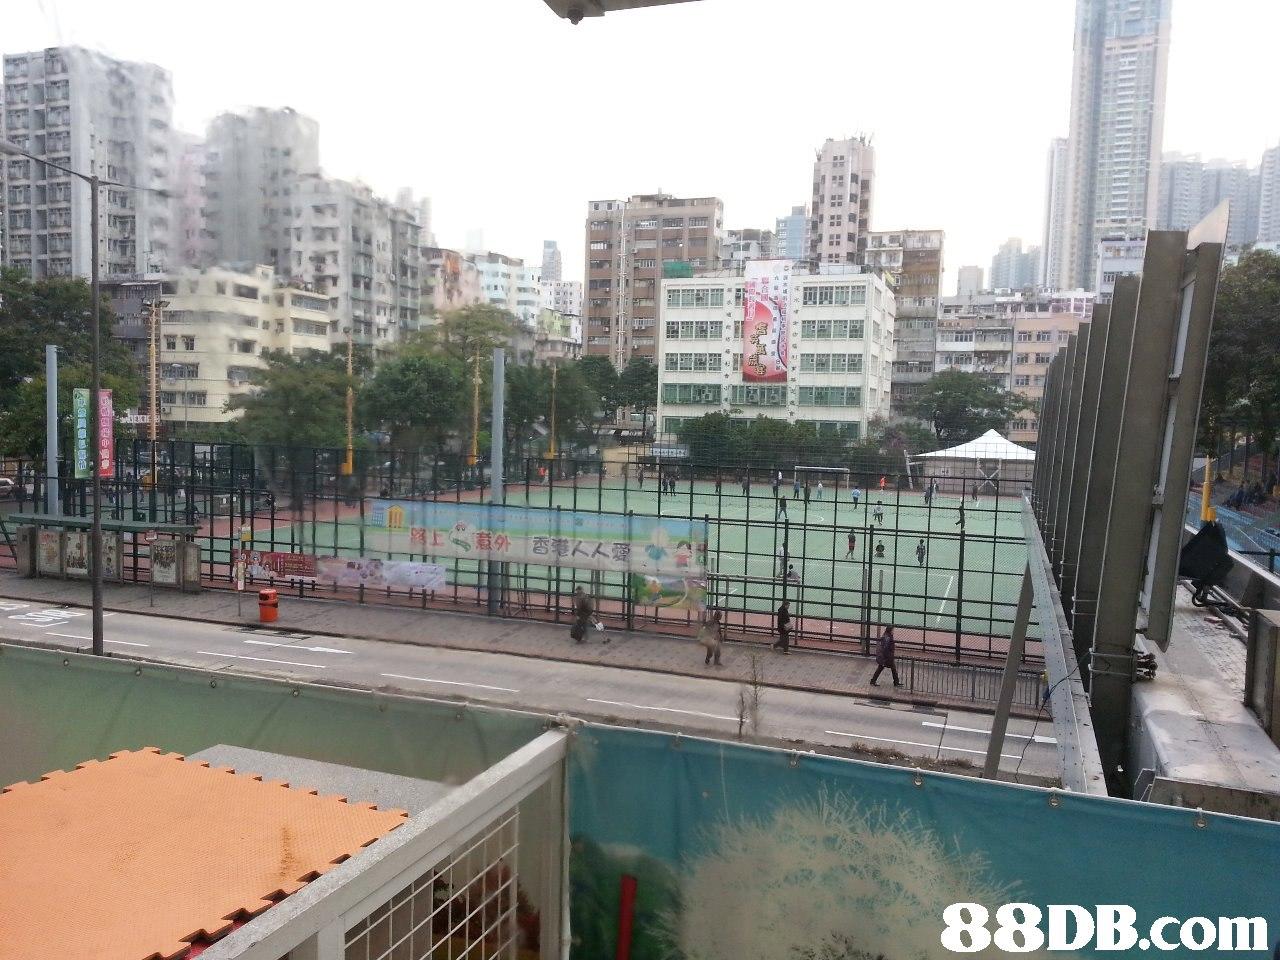 Metropolitan area,Condominium,Urban area,Human settlement,City